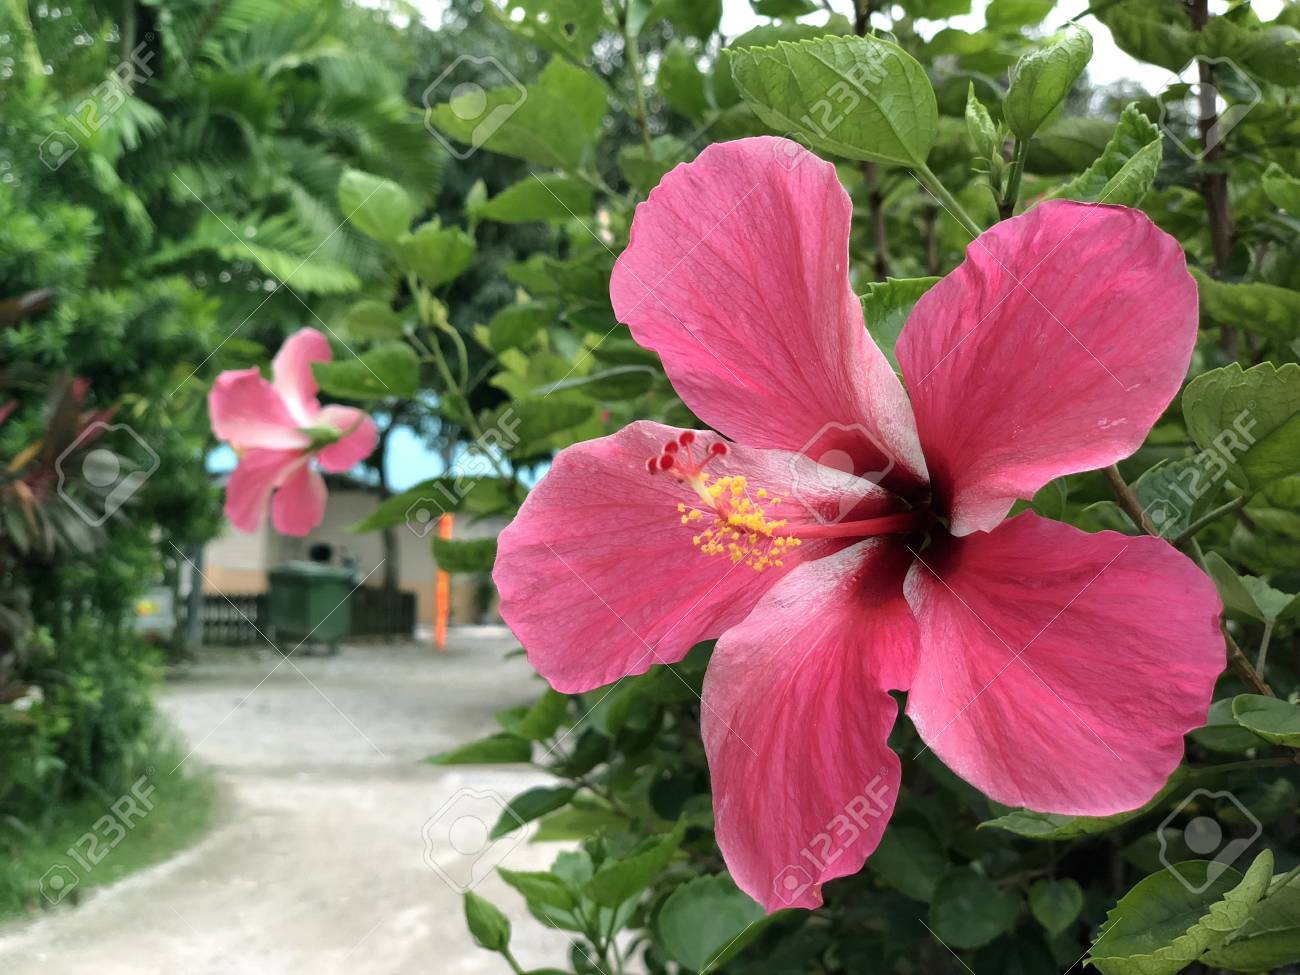 Red hibiscus flower malaysias national flower locally known red hibiscus flower malaysias national flower locally known as bunga raya stock photo izmirmasajfo